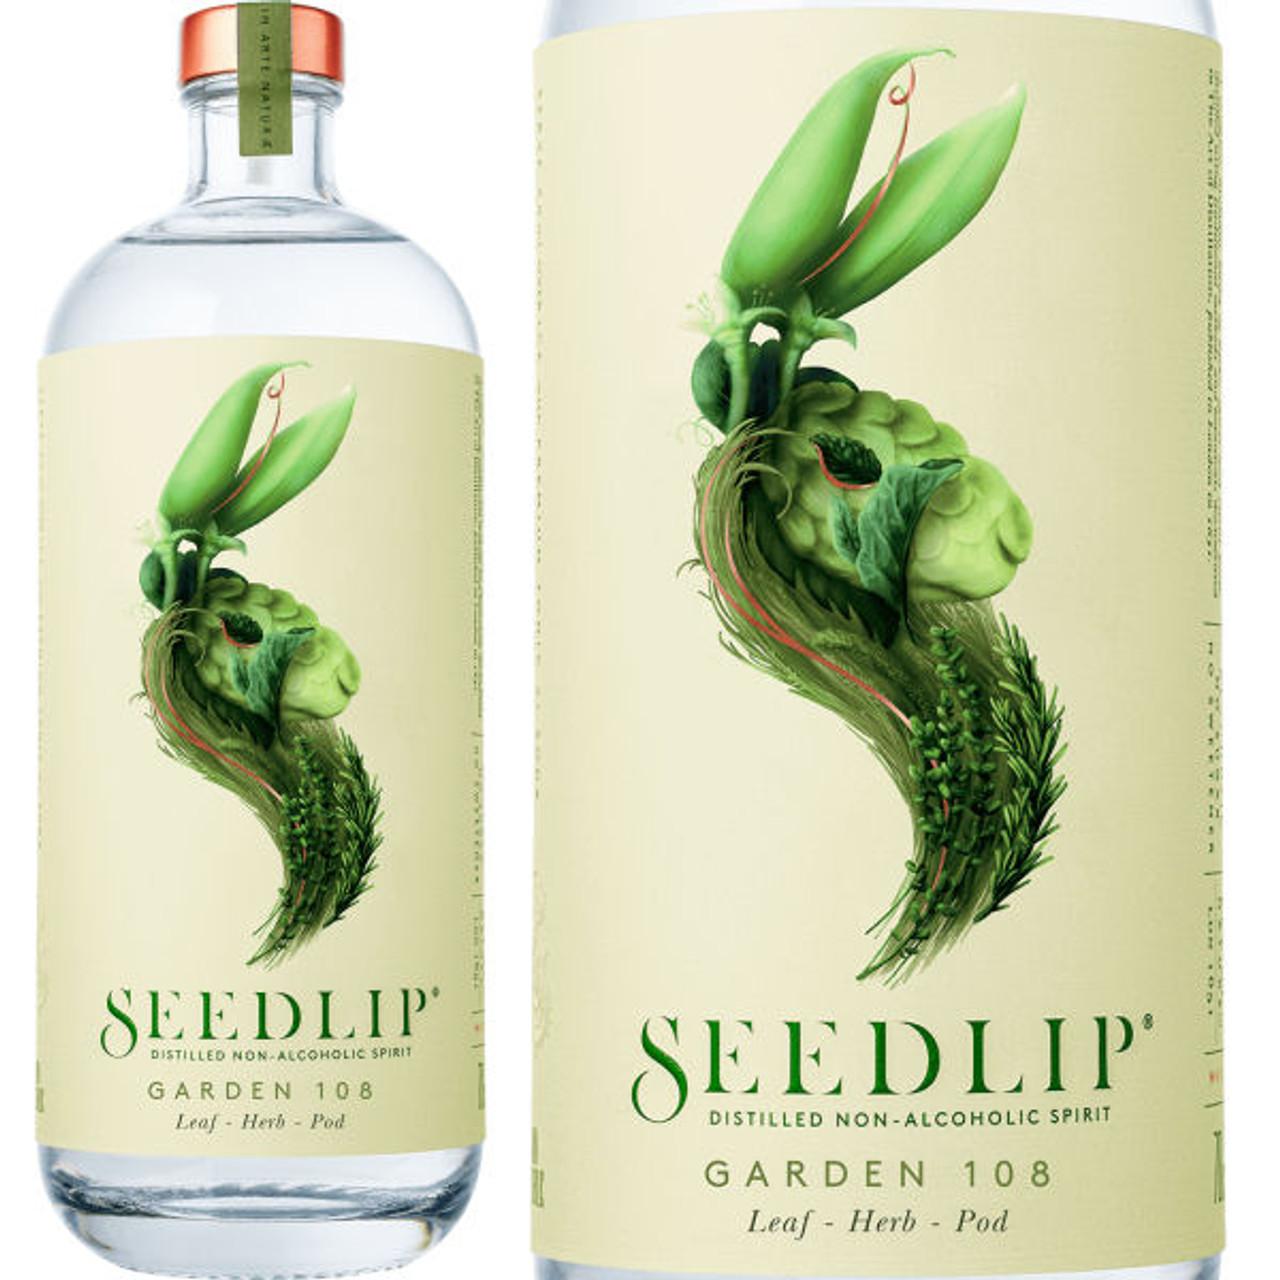 Seedlip Garden 108 Distilled Non-Alcoholic Spirits 700ml